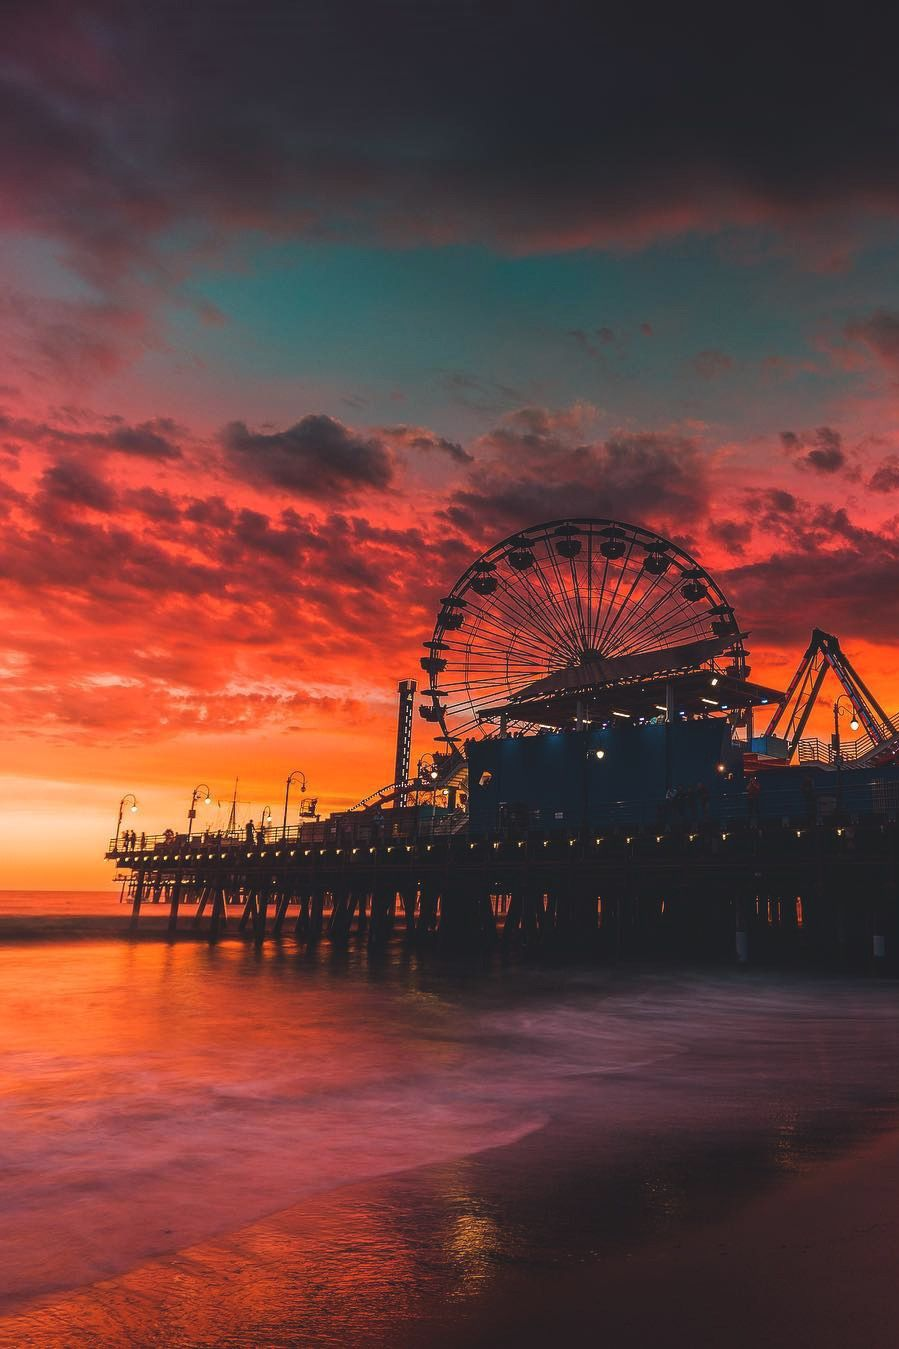 Lsleofskye Santa Monica California Ideas De Fondos De